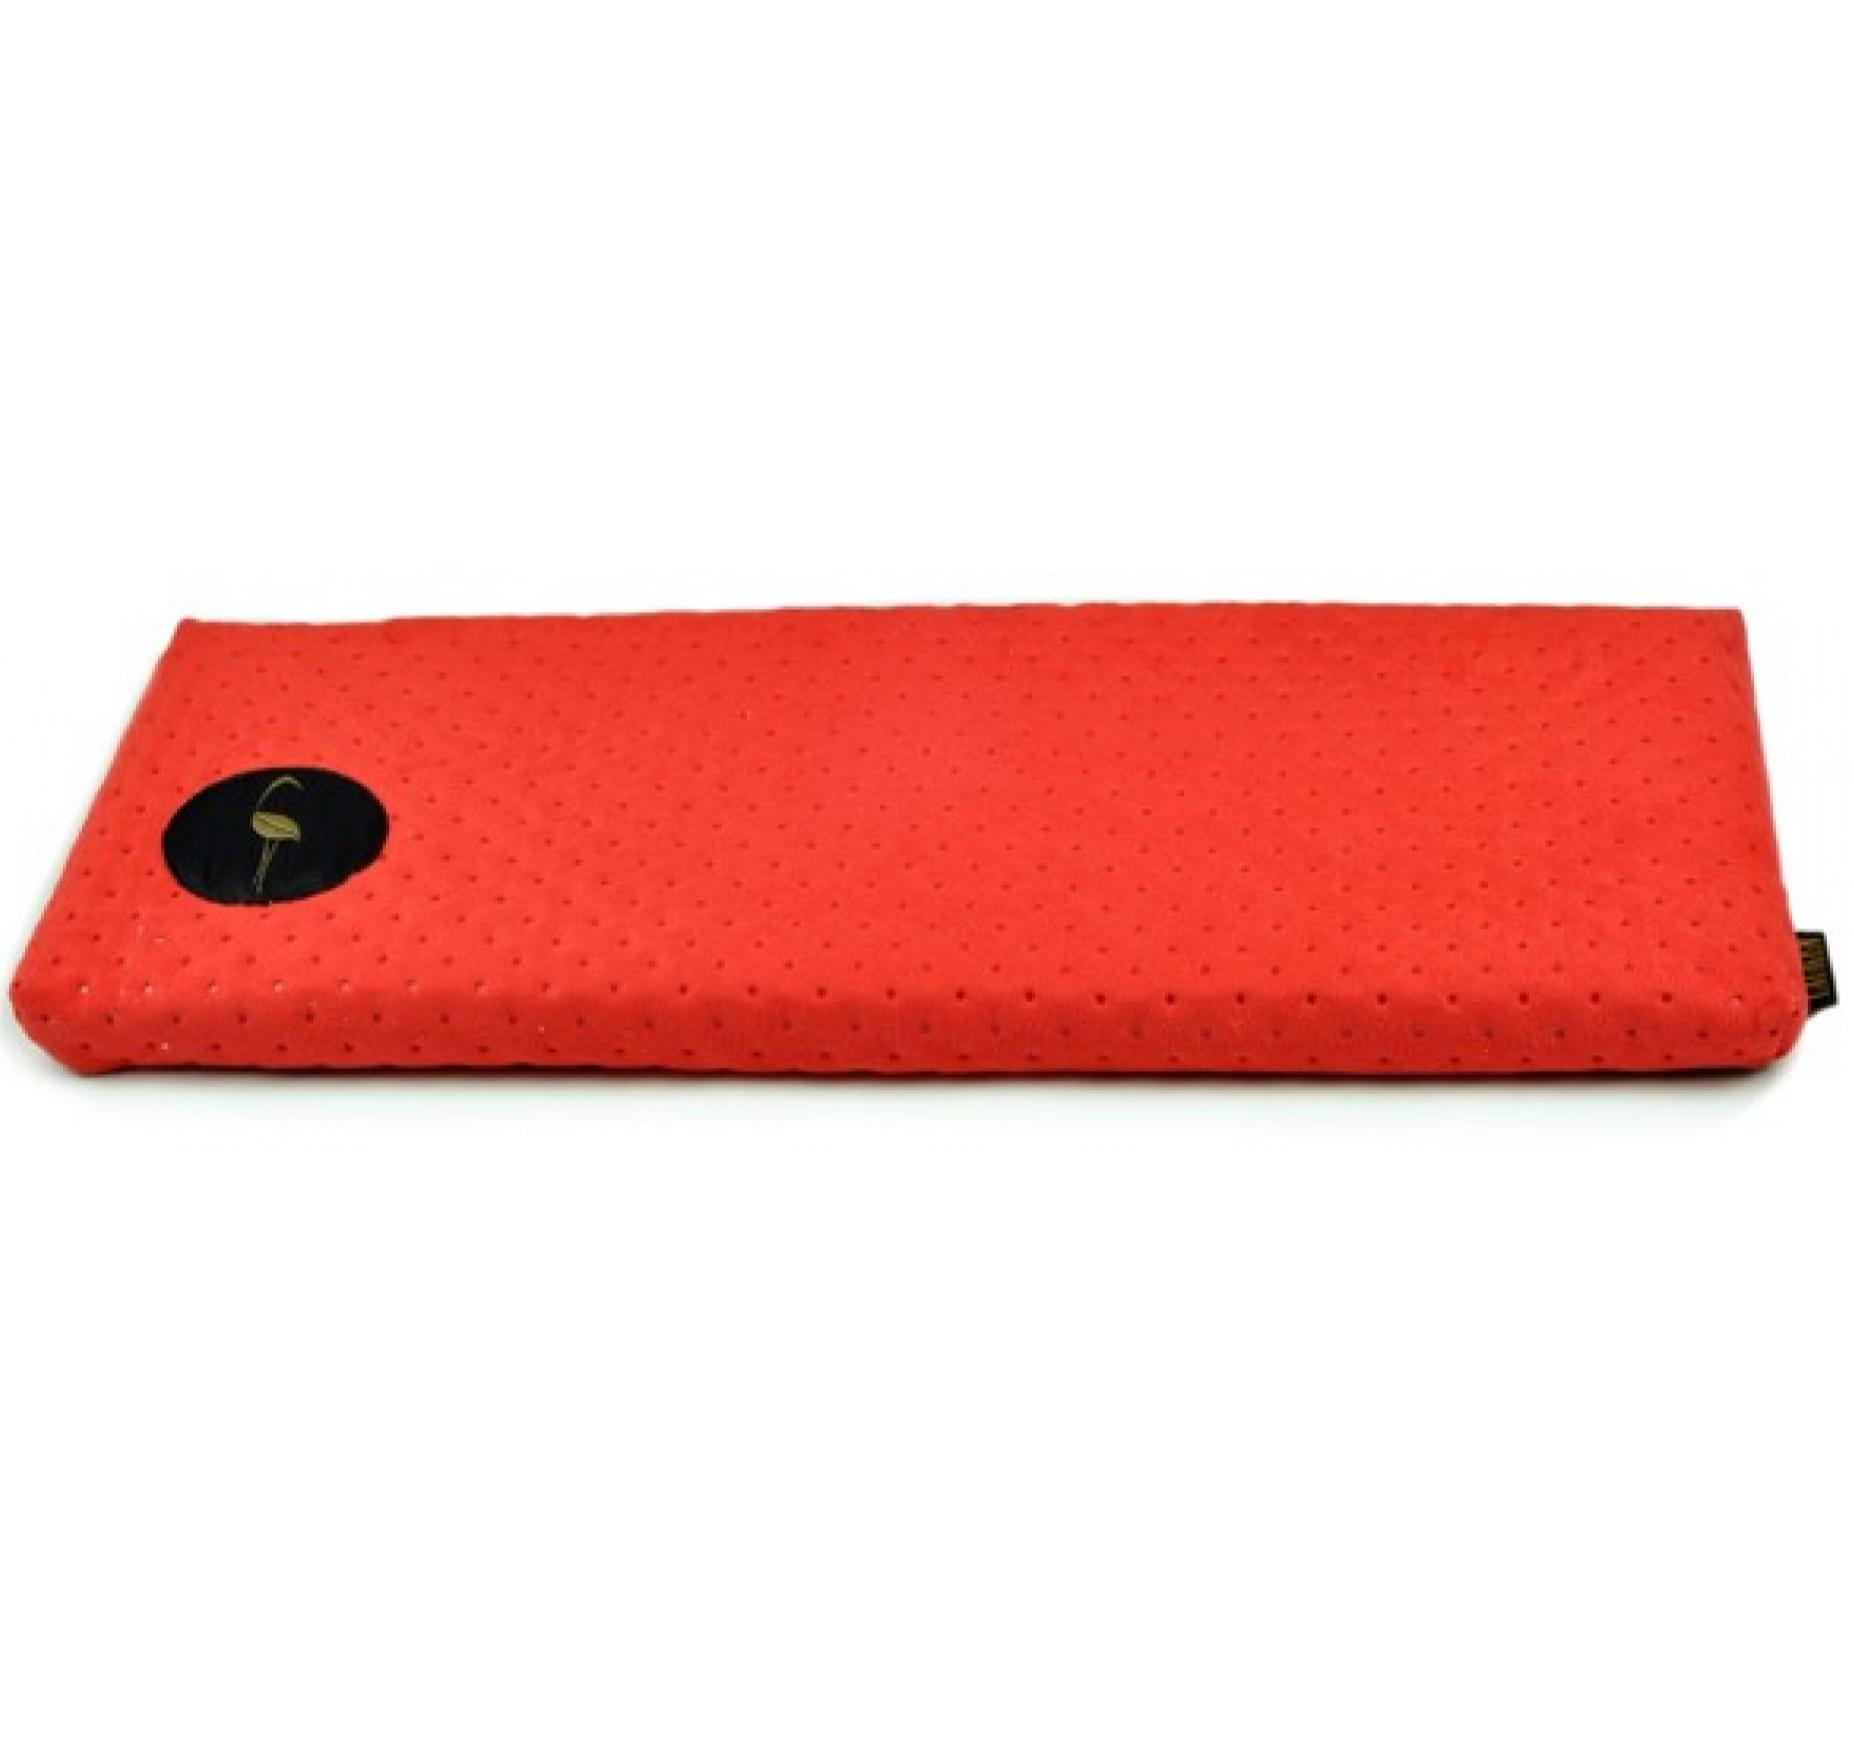 LAUREN design Parapeciak CLEO czerwony pikowany